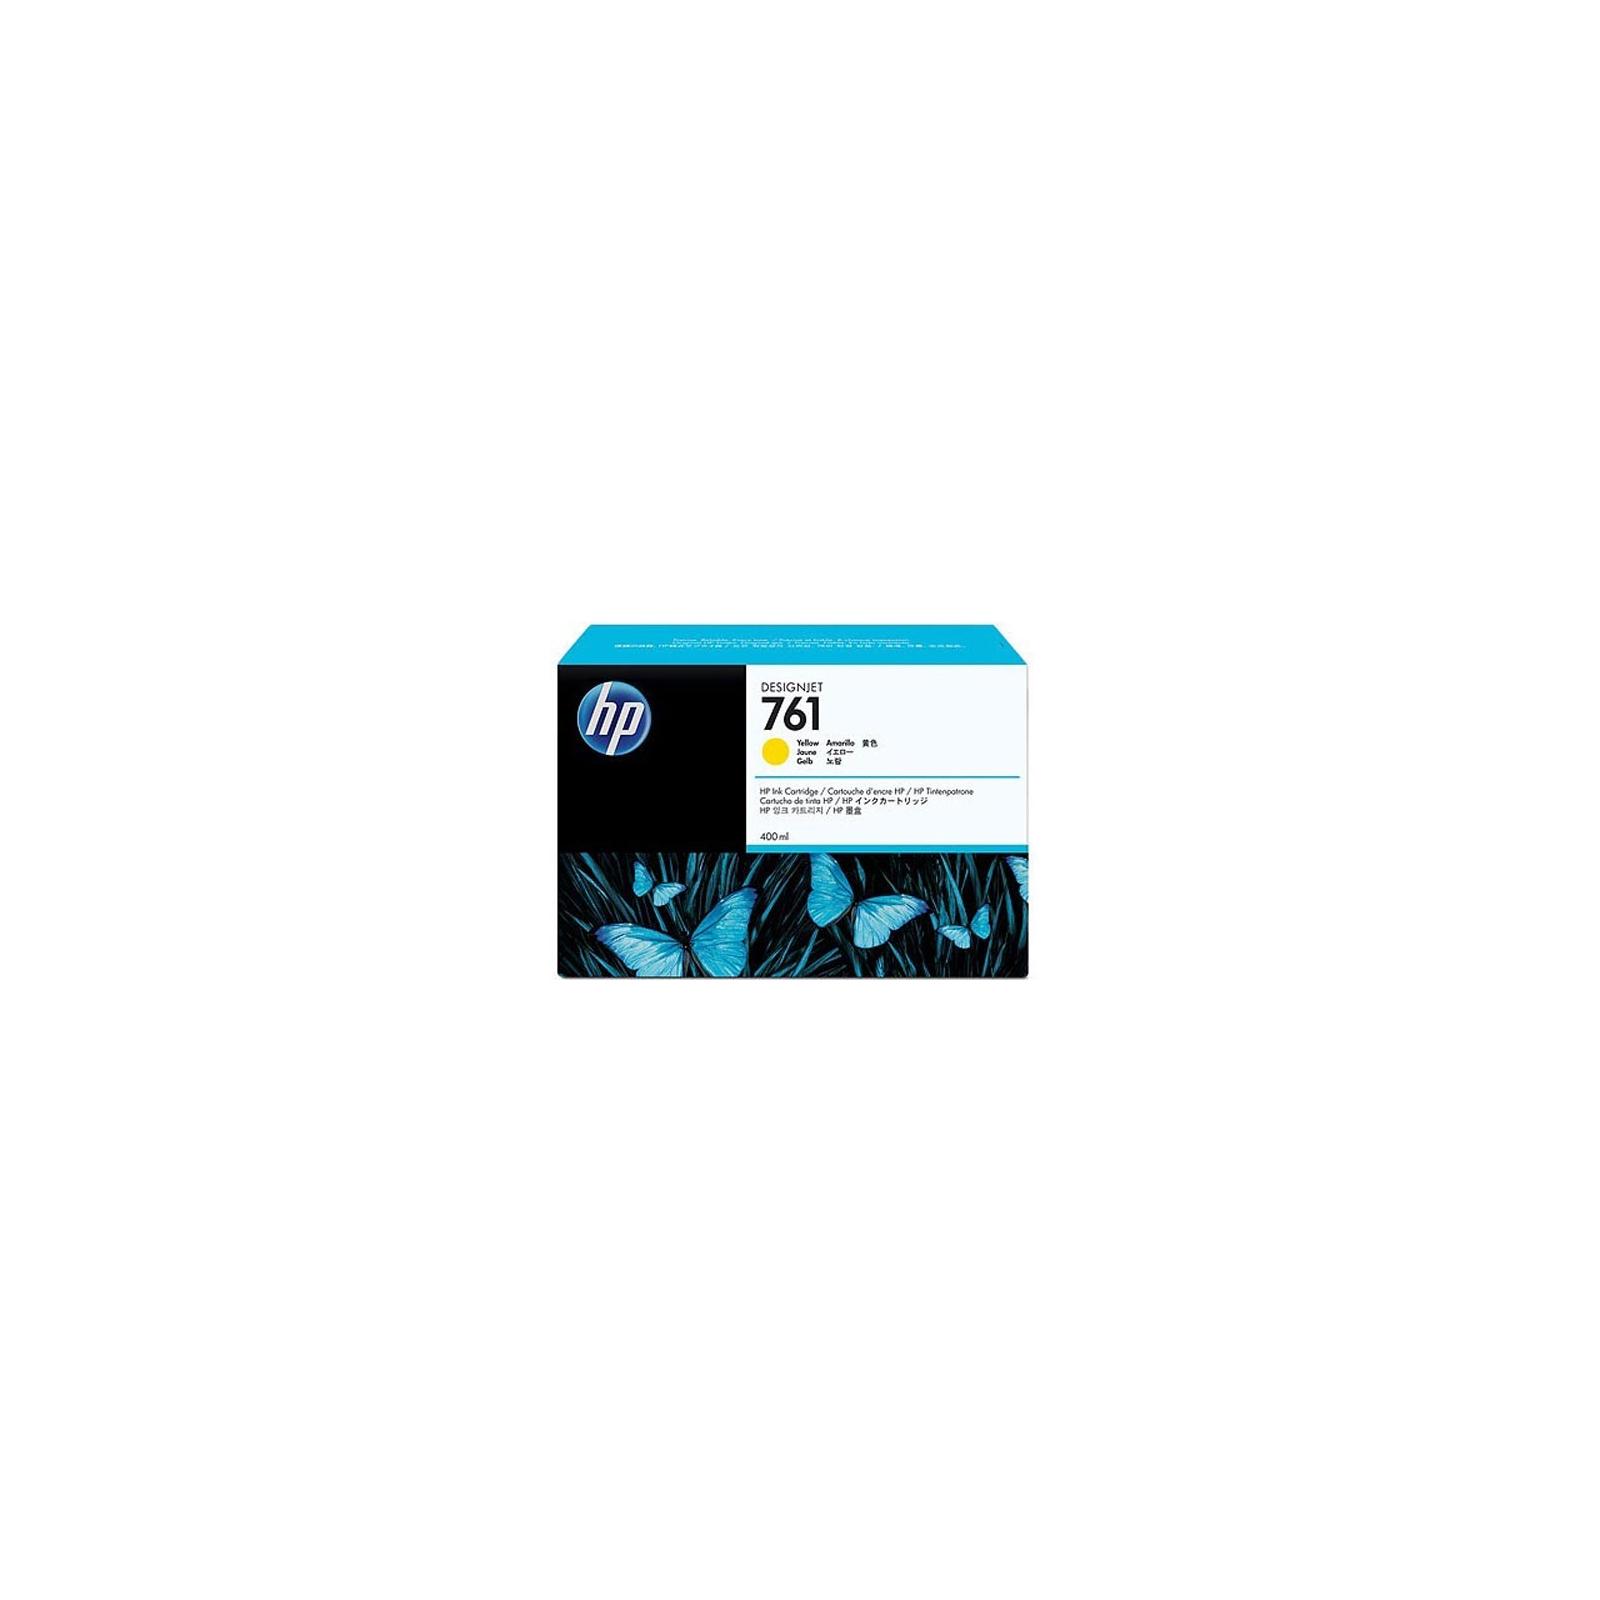 Картридж HP DJ No.761 DesignJet T7100 yellow (CM992A)